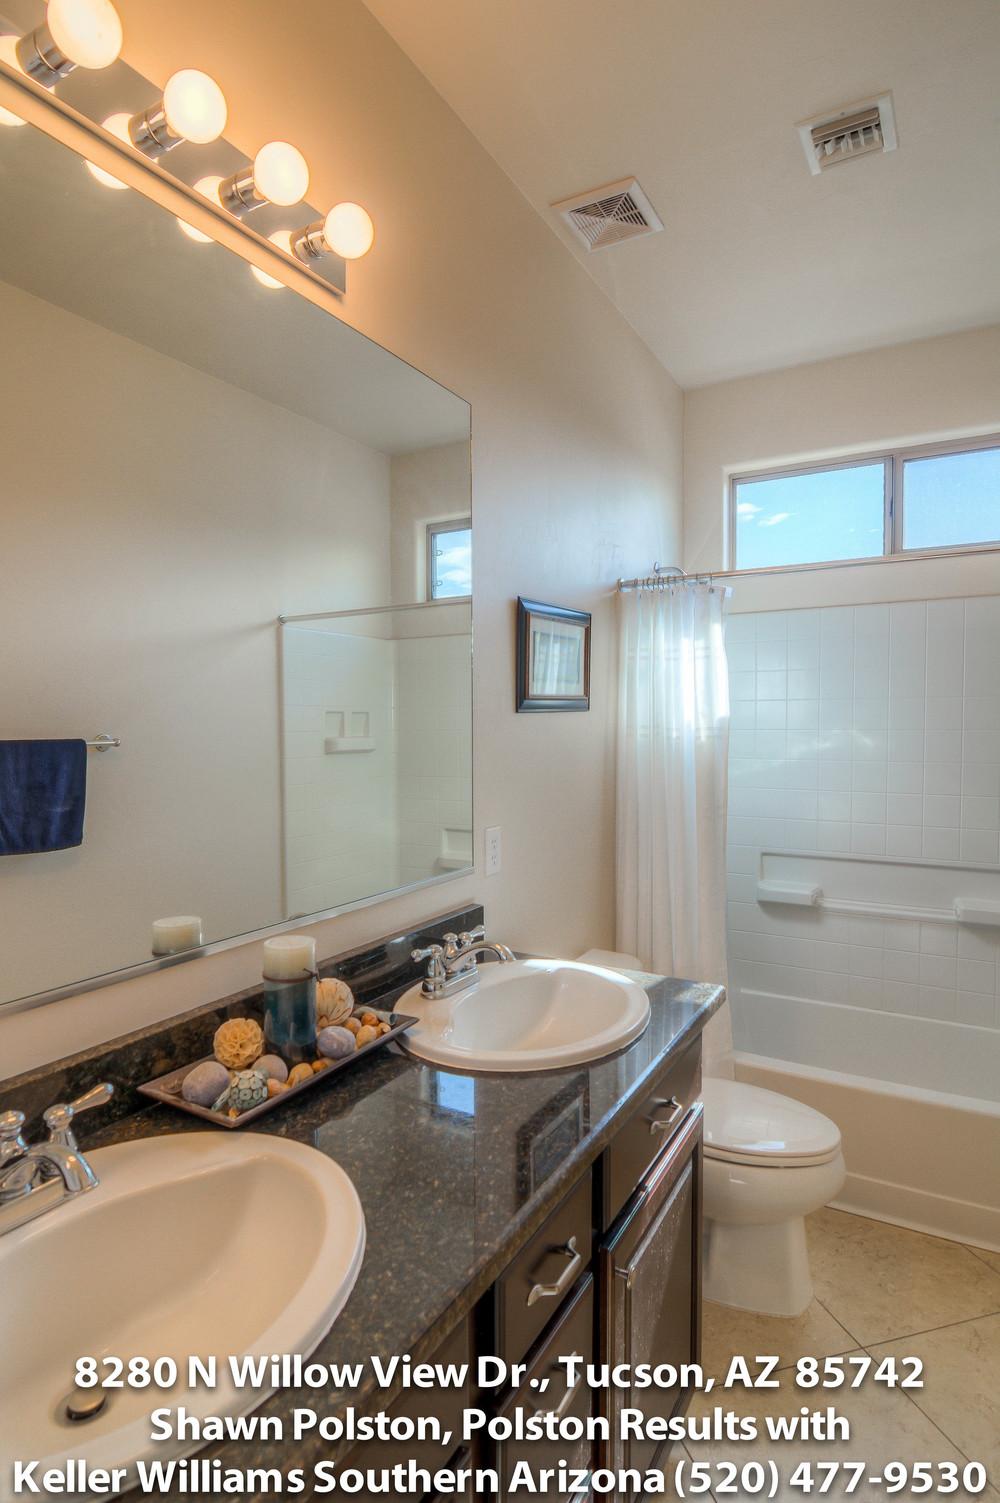 31 Bathroomtiff.jpg